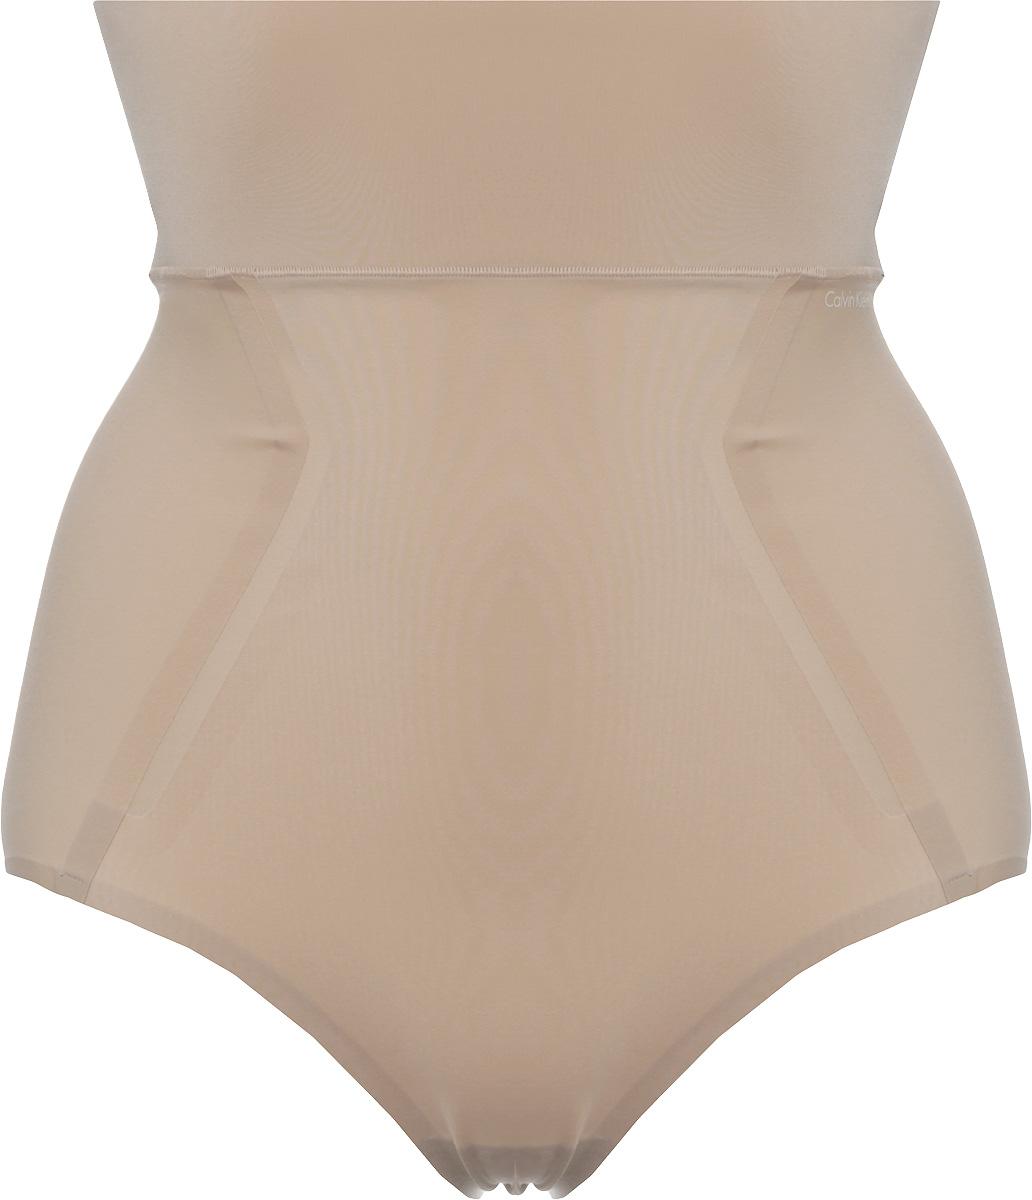 Трусы женские Calvin Klein Underwear, цвет: бежевый. QF4263E_20N. Размер S (42) трусы женские calvin klein underwear цвет черный qf1950e 001 размер s 42